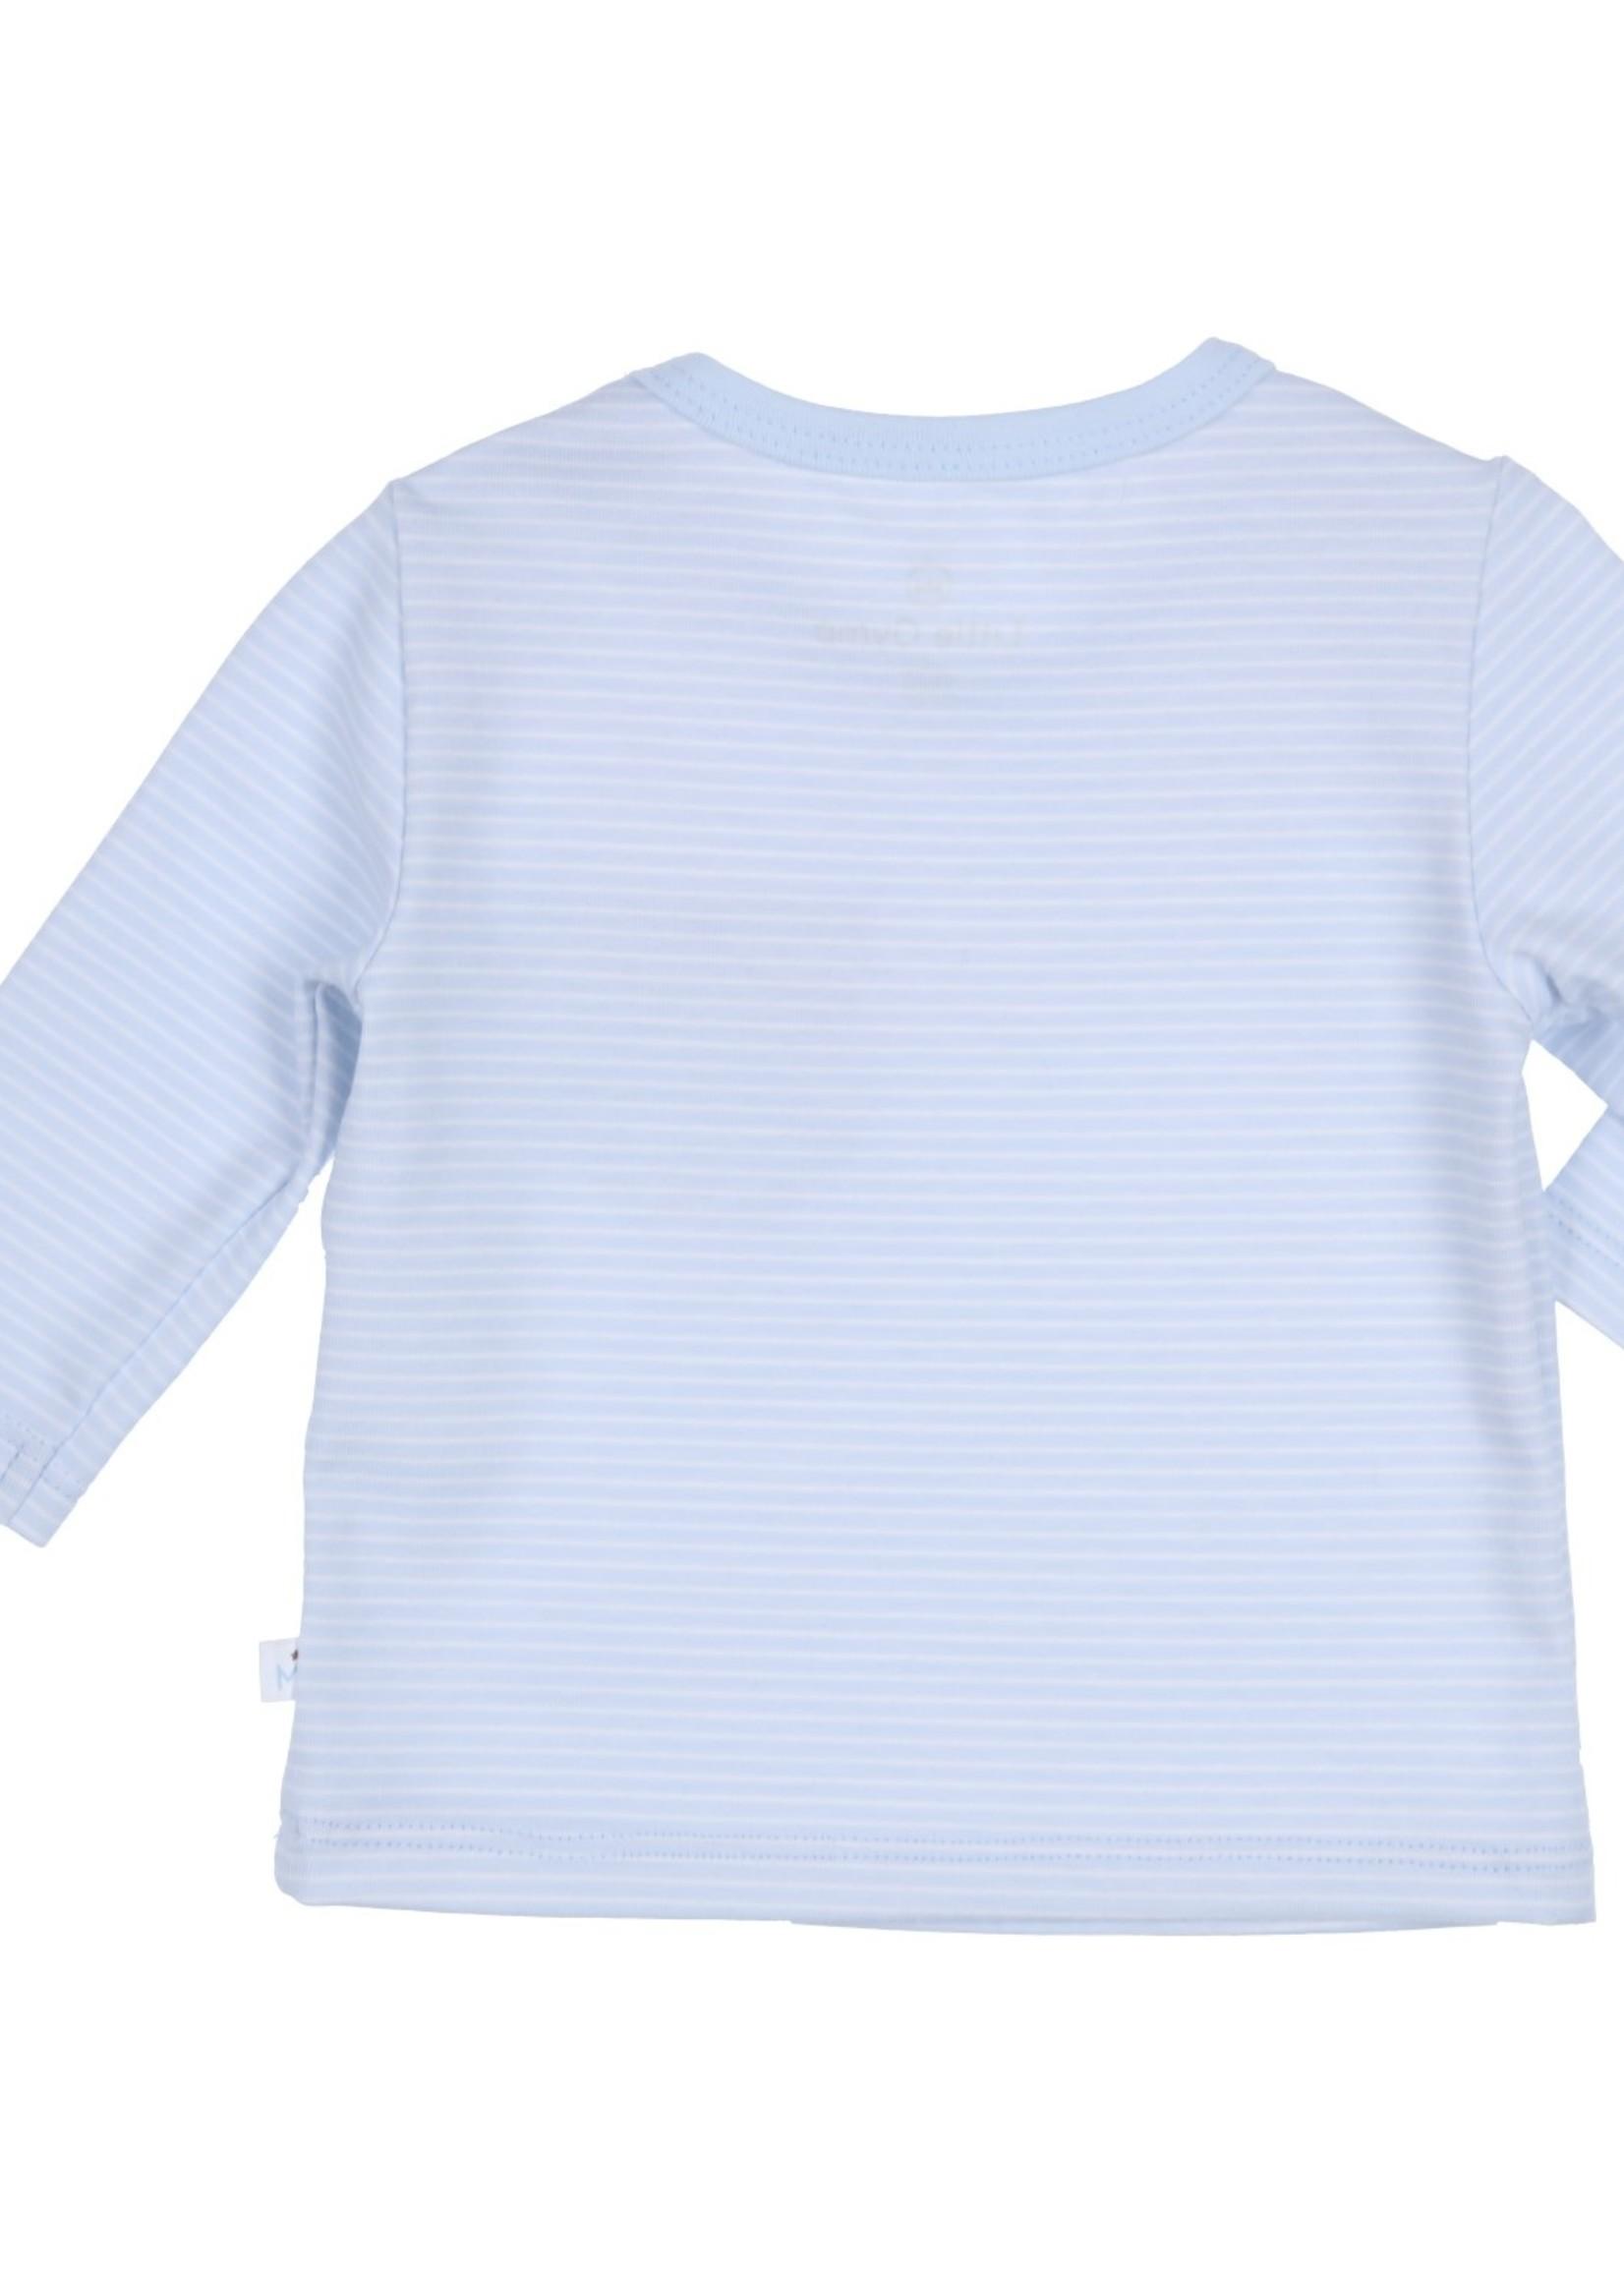 Gymp Gymp longsleeve pocket lichtblauw/wit